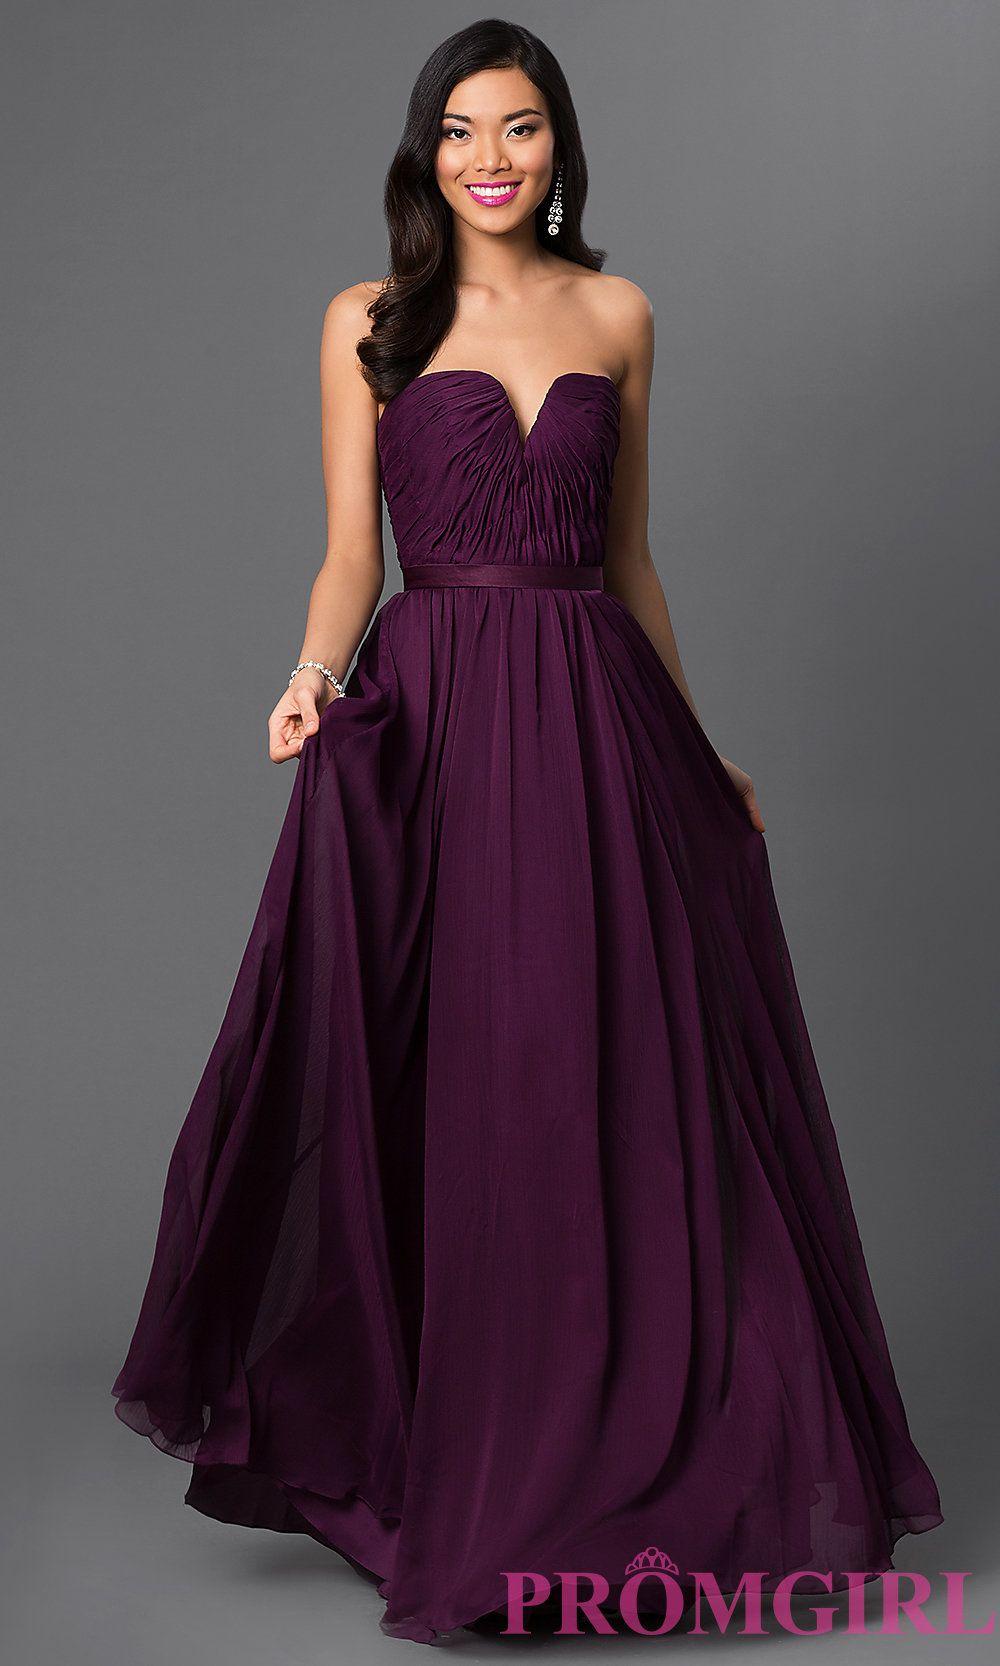 Long purple dresses strapless purple bridesmaid dress promgirl